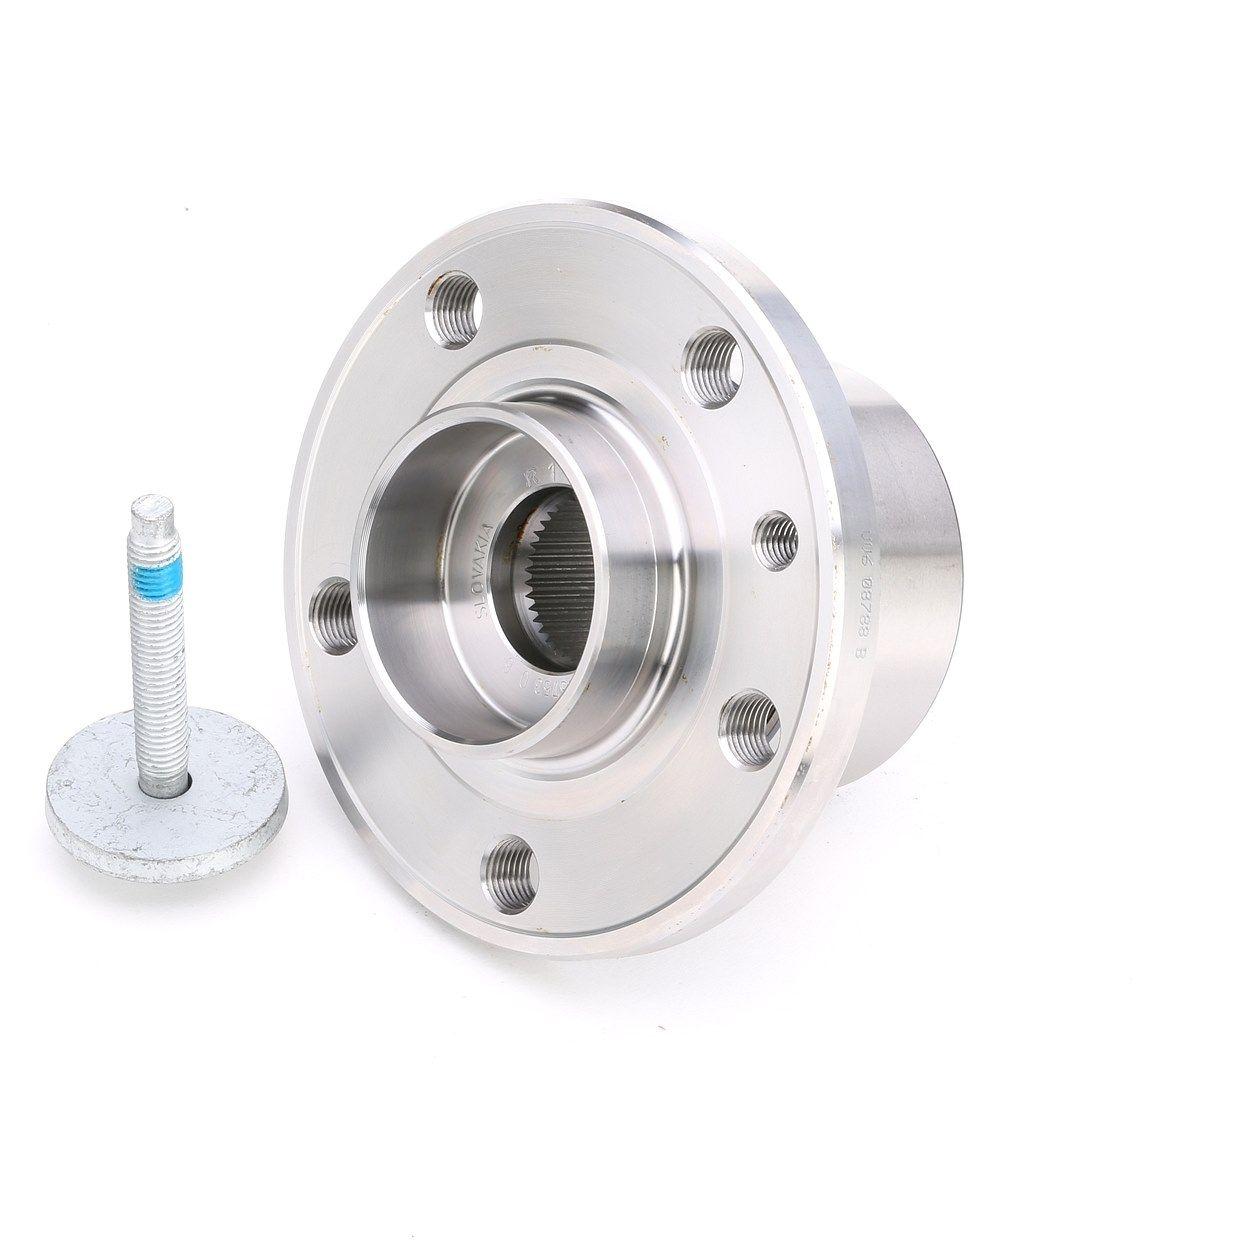 Wheel Bearing FAG 713 6604 60 rating